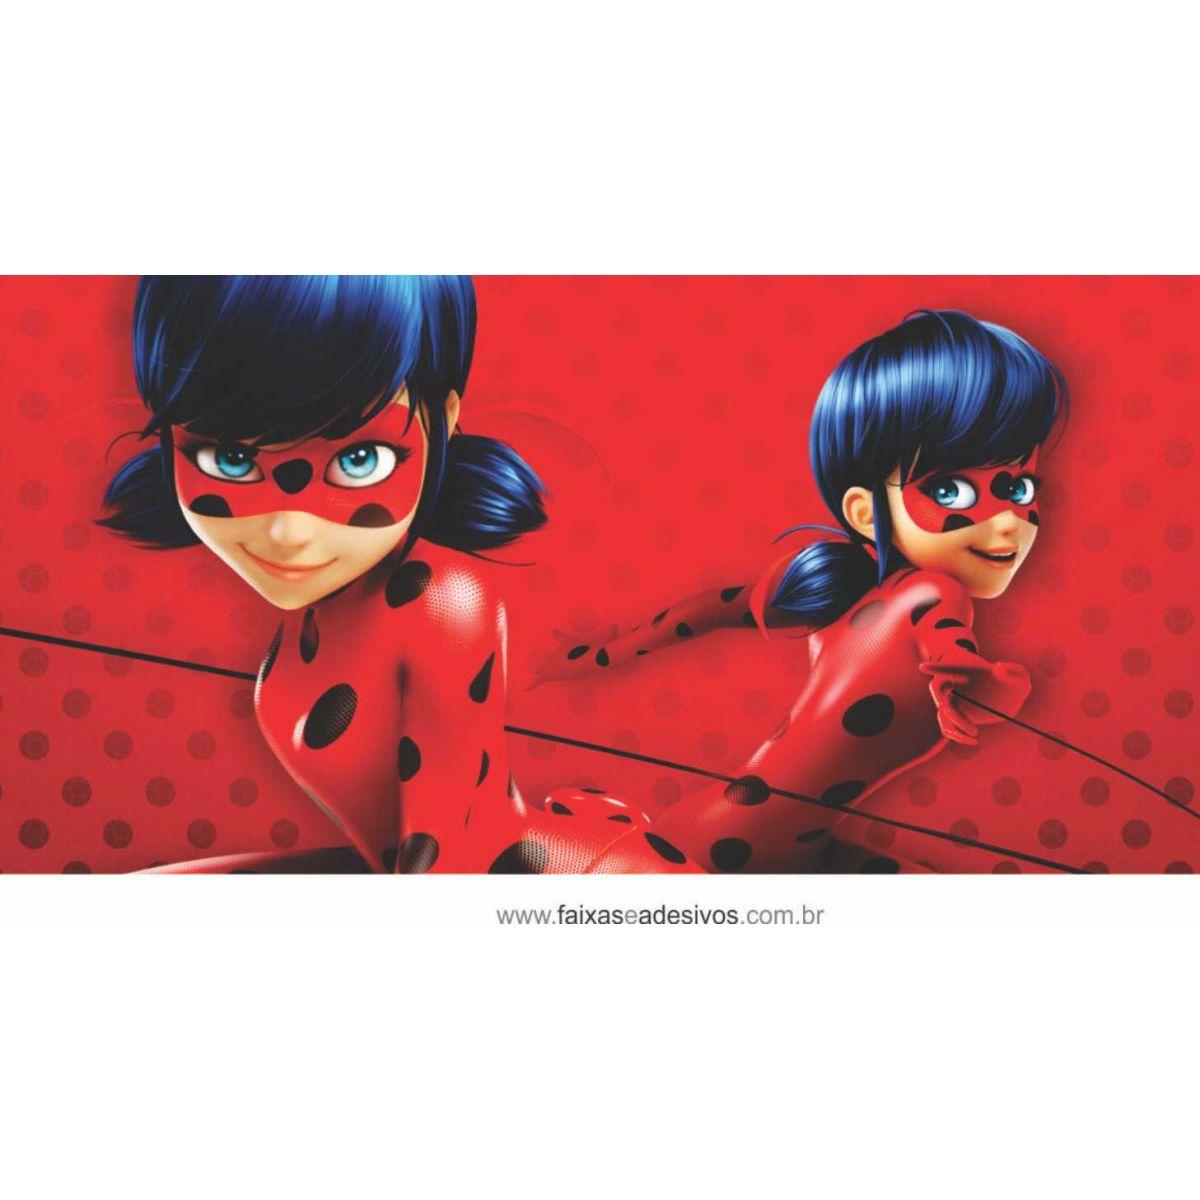 Painel de Aniversário 208 - Miraculous Ladybug 3  - FAC Signs Impressão Digital